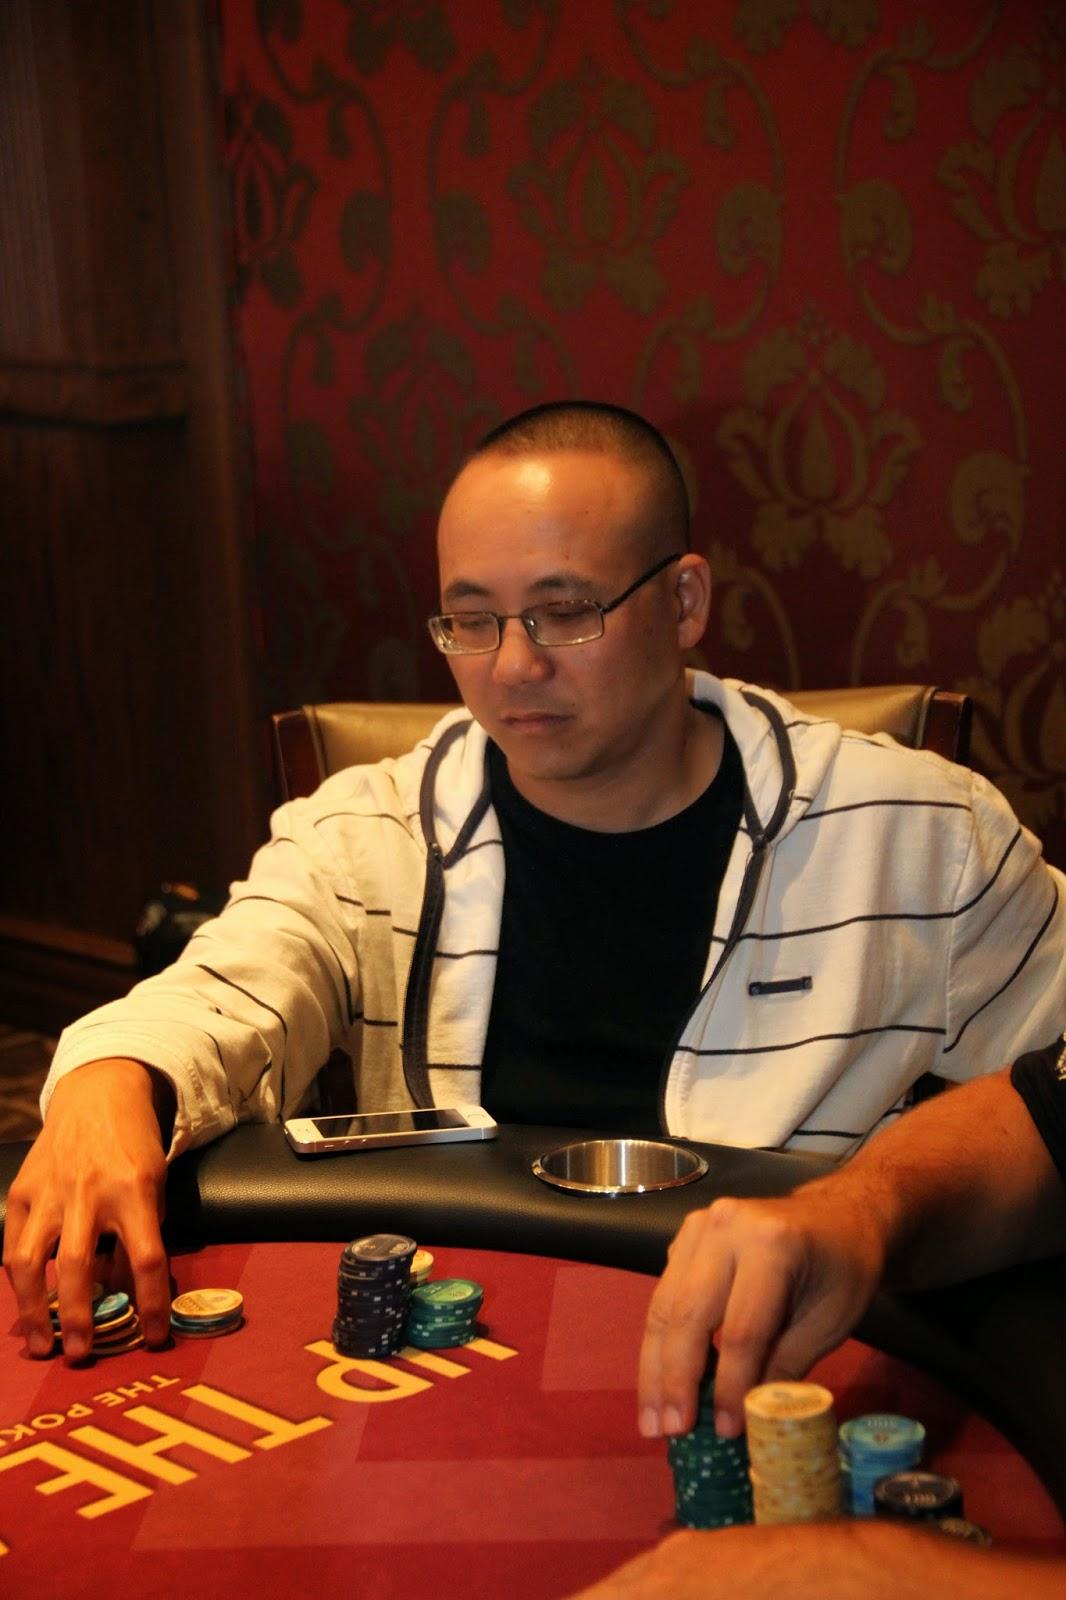 Poker at thunder valley casino gambling addictions help